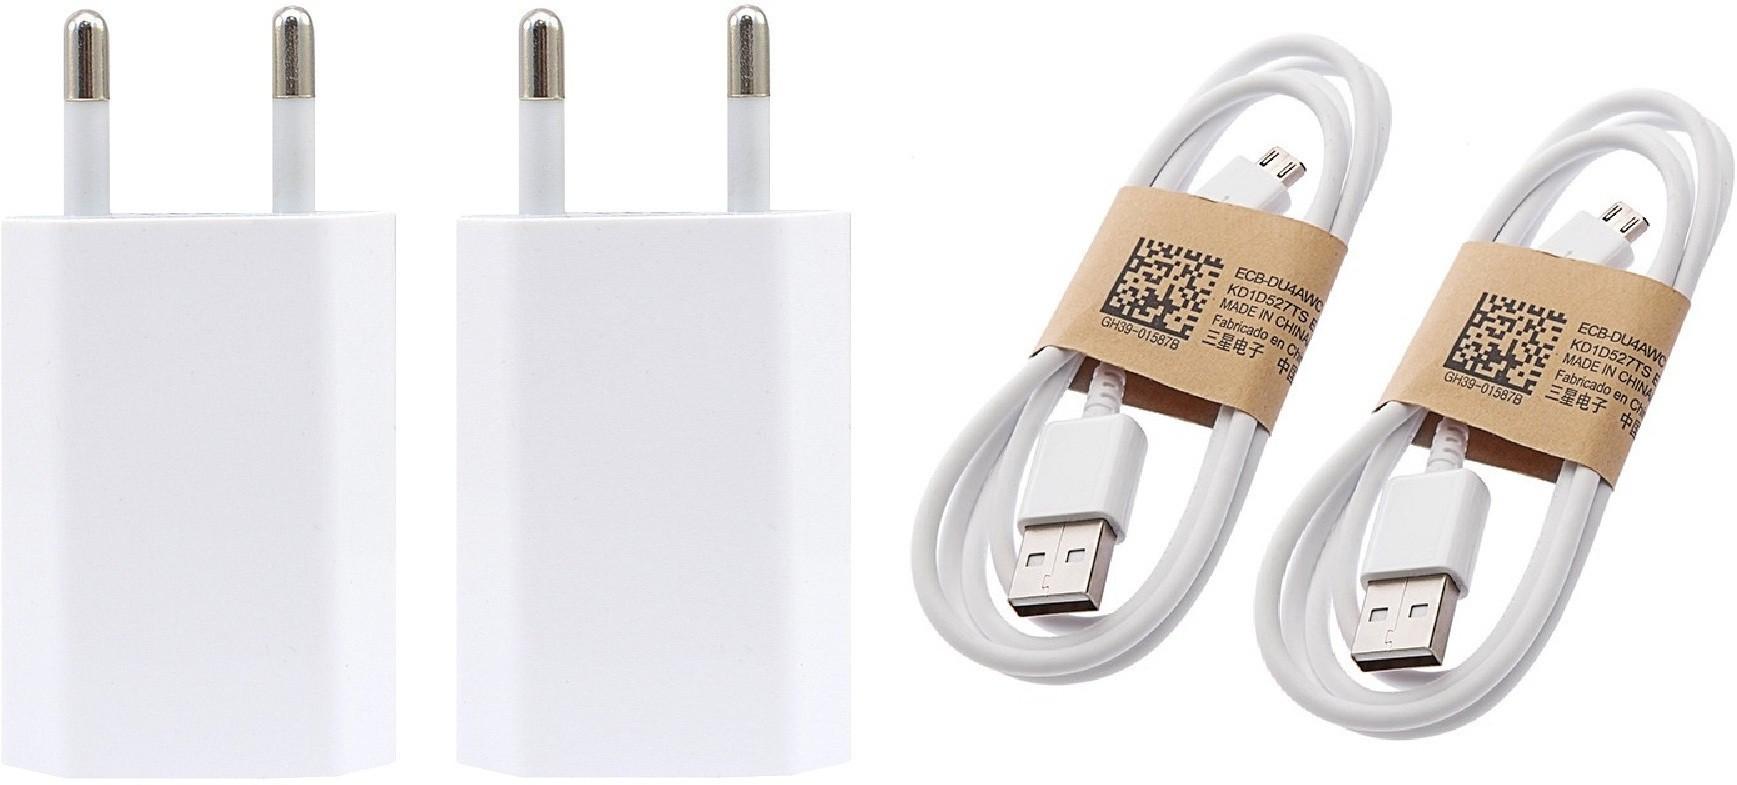 Waves Chg+Cab-LG-Nexus-5 Mobile Charger(White)